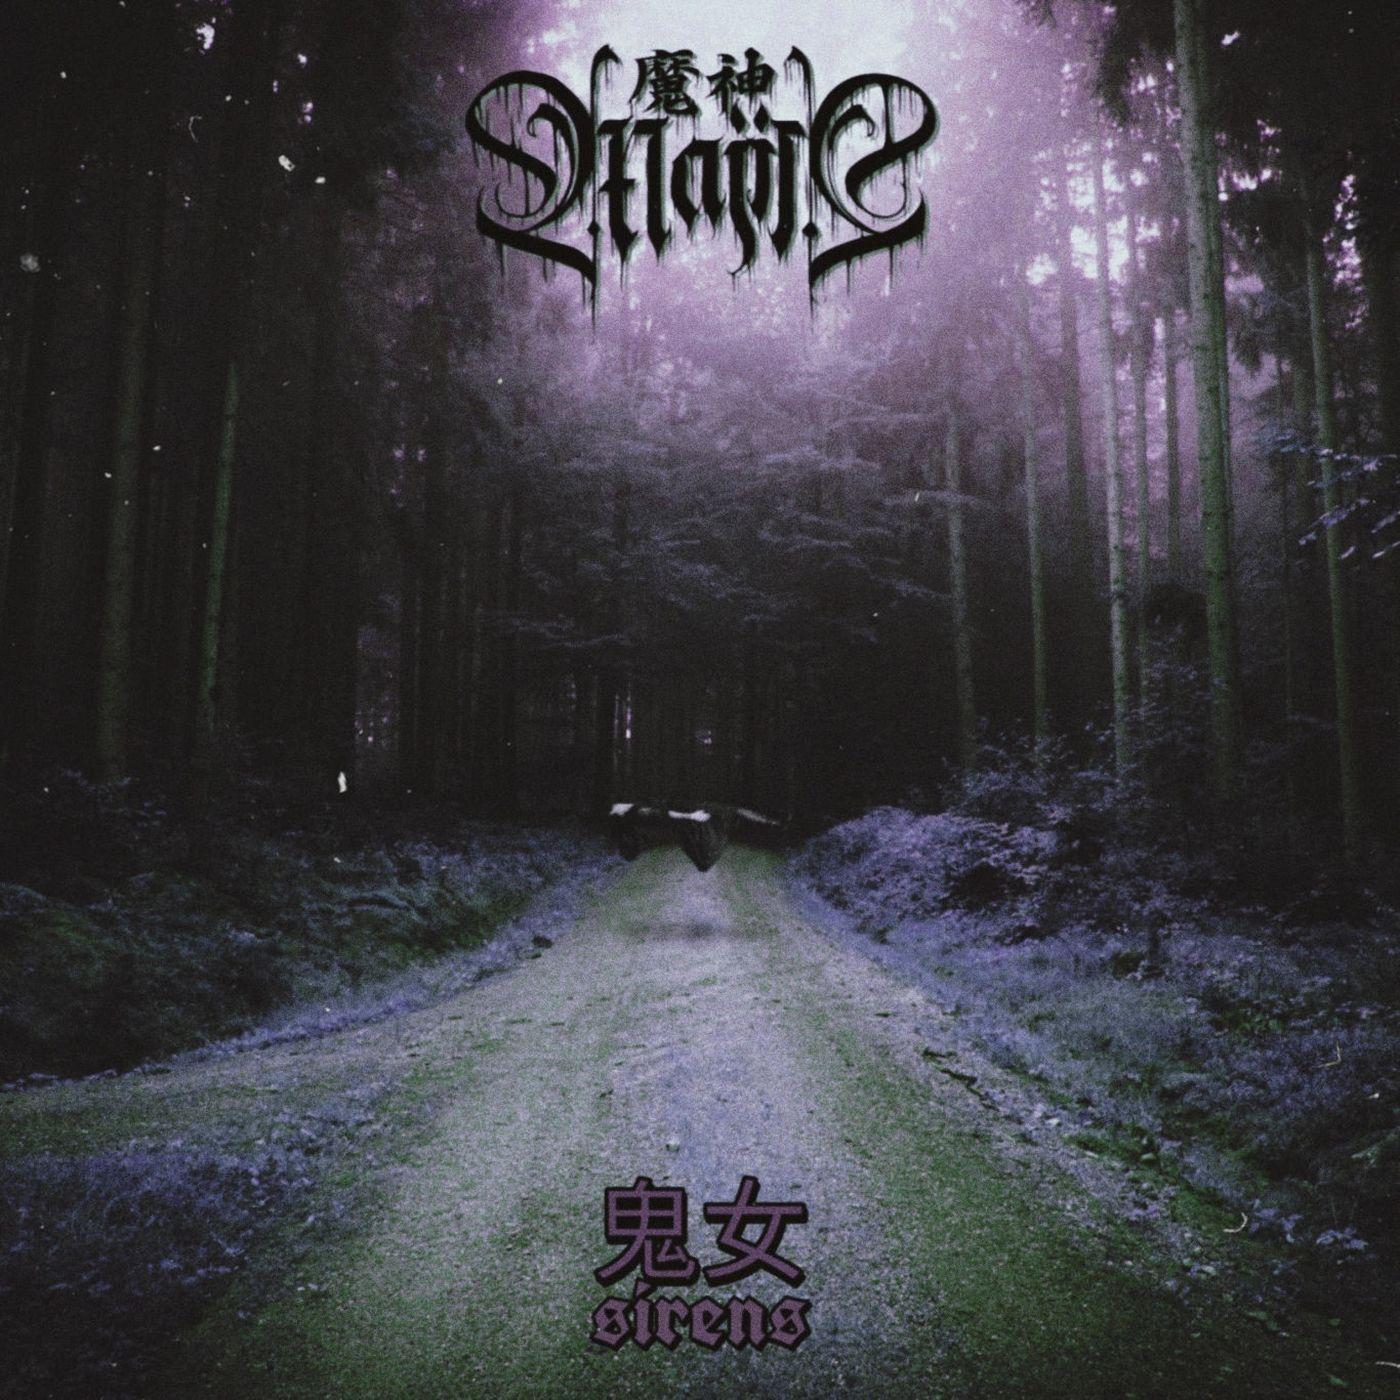 Majin - Sirens [single] (2021)